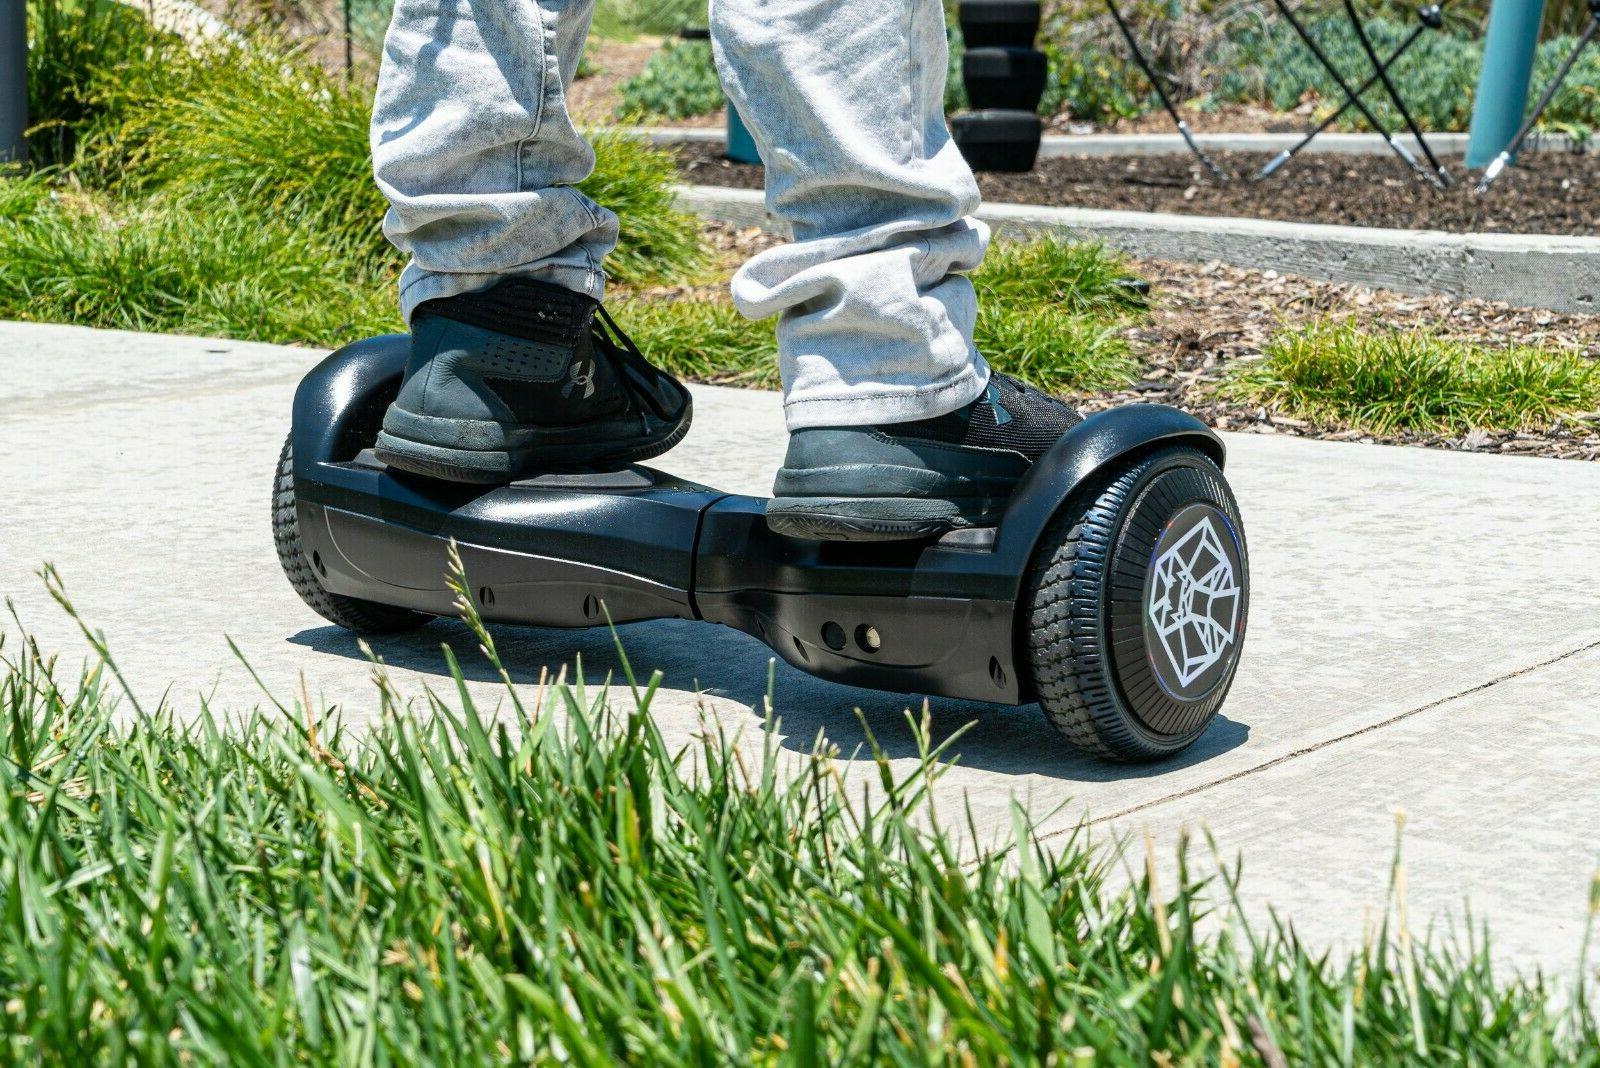 Swagtron T882 Kids Hoverboard Motors Battery